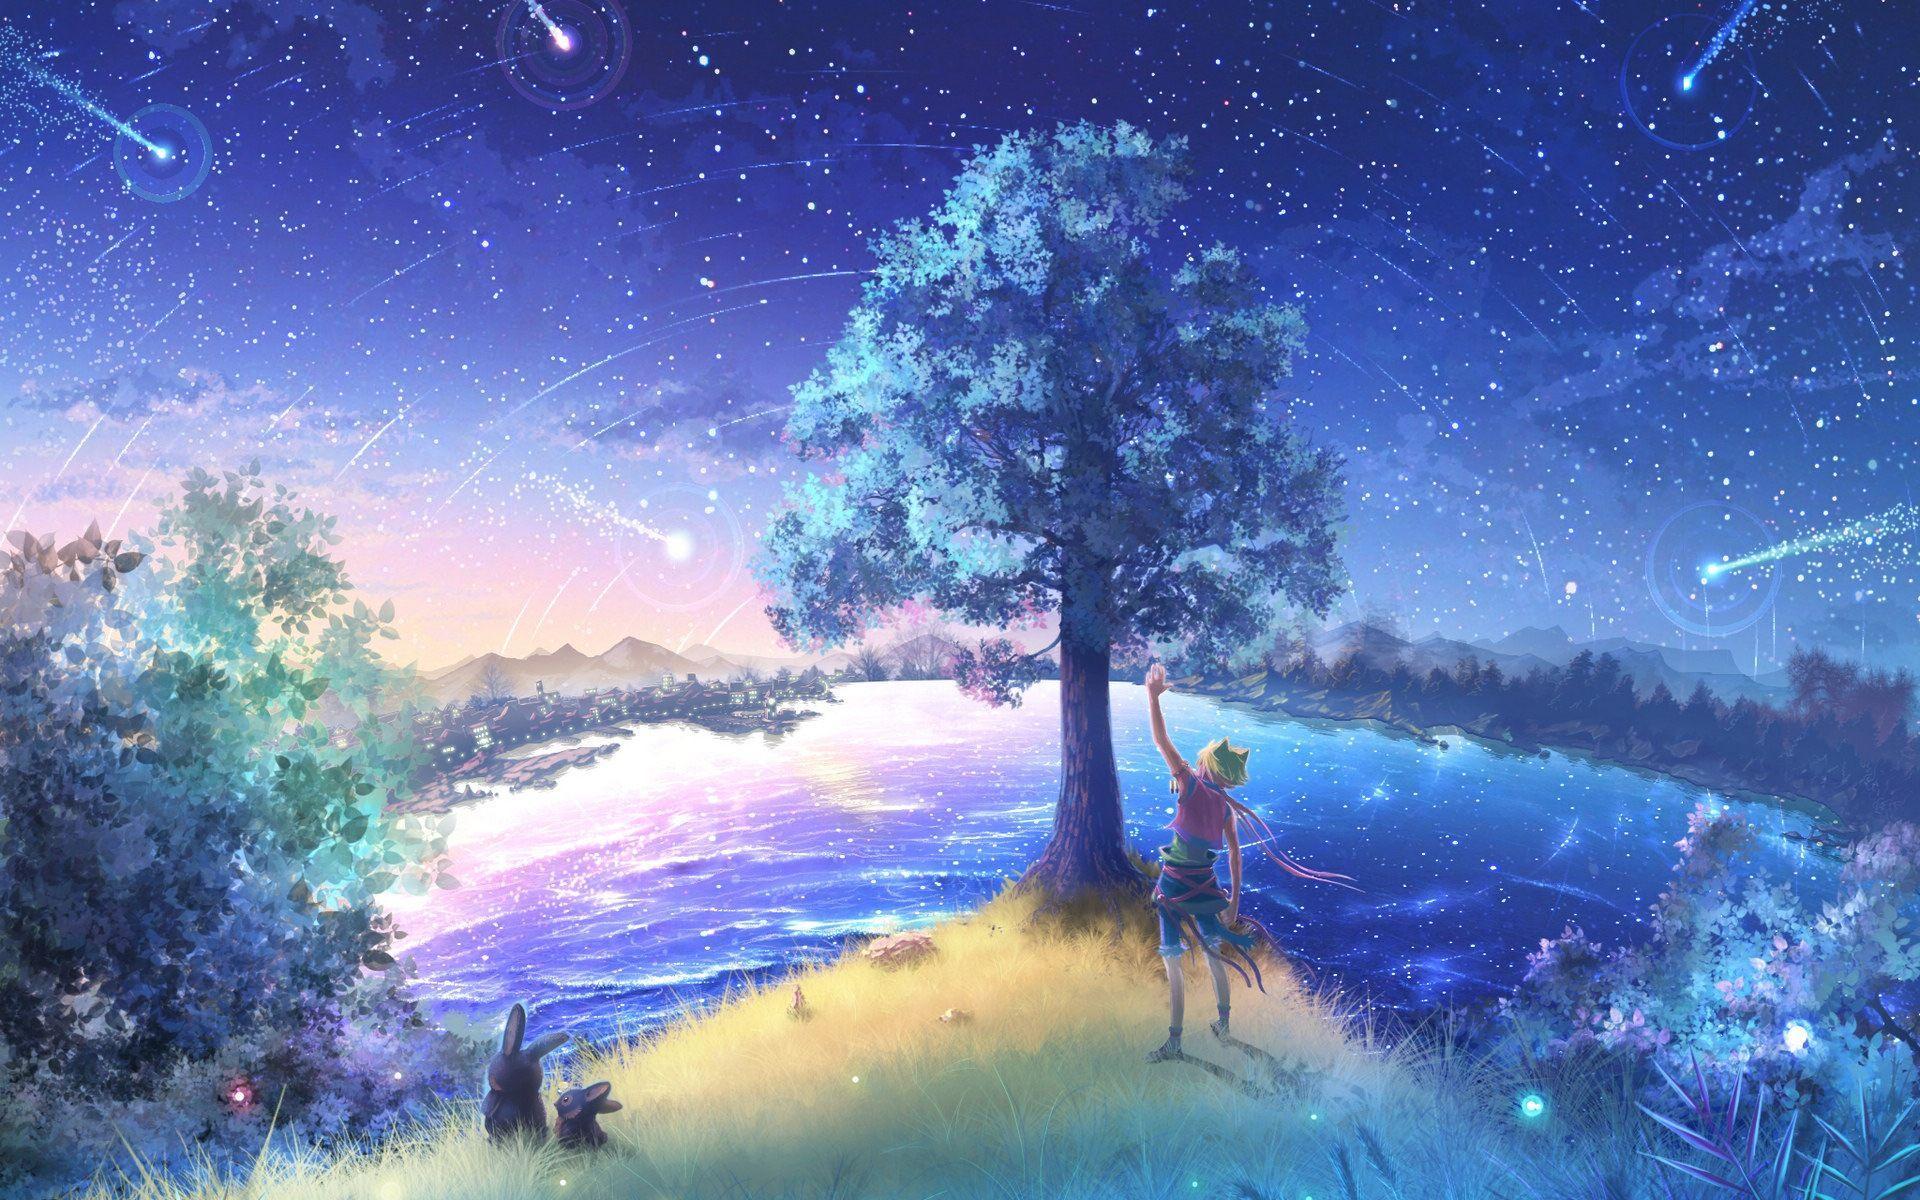 Beautiful Anime Wallpapers - Top Free